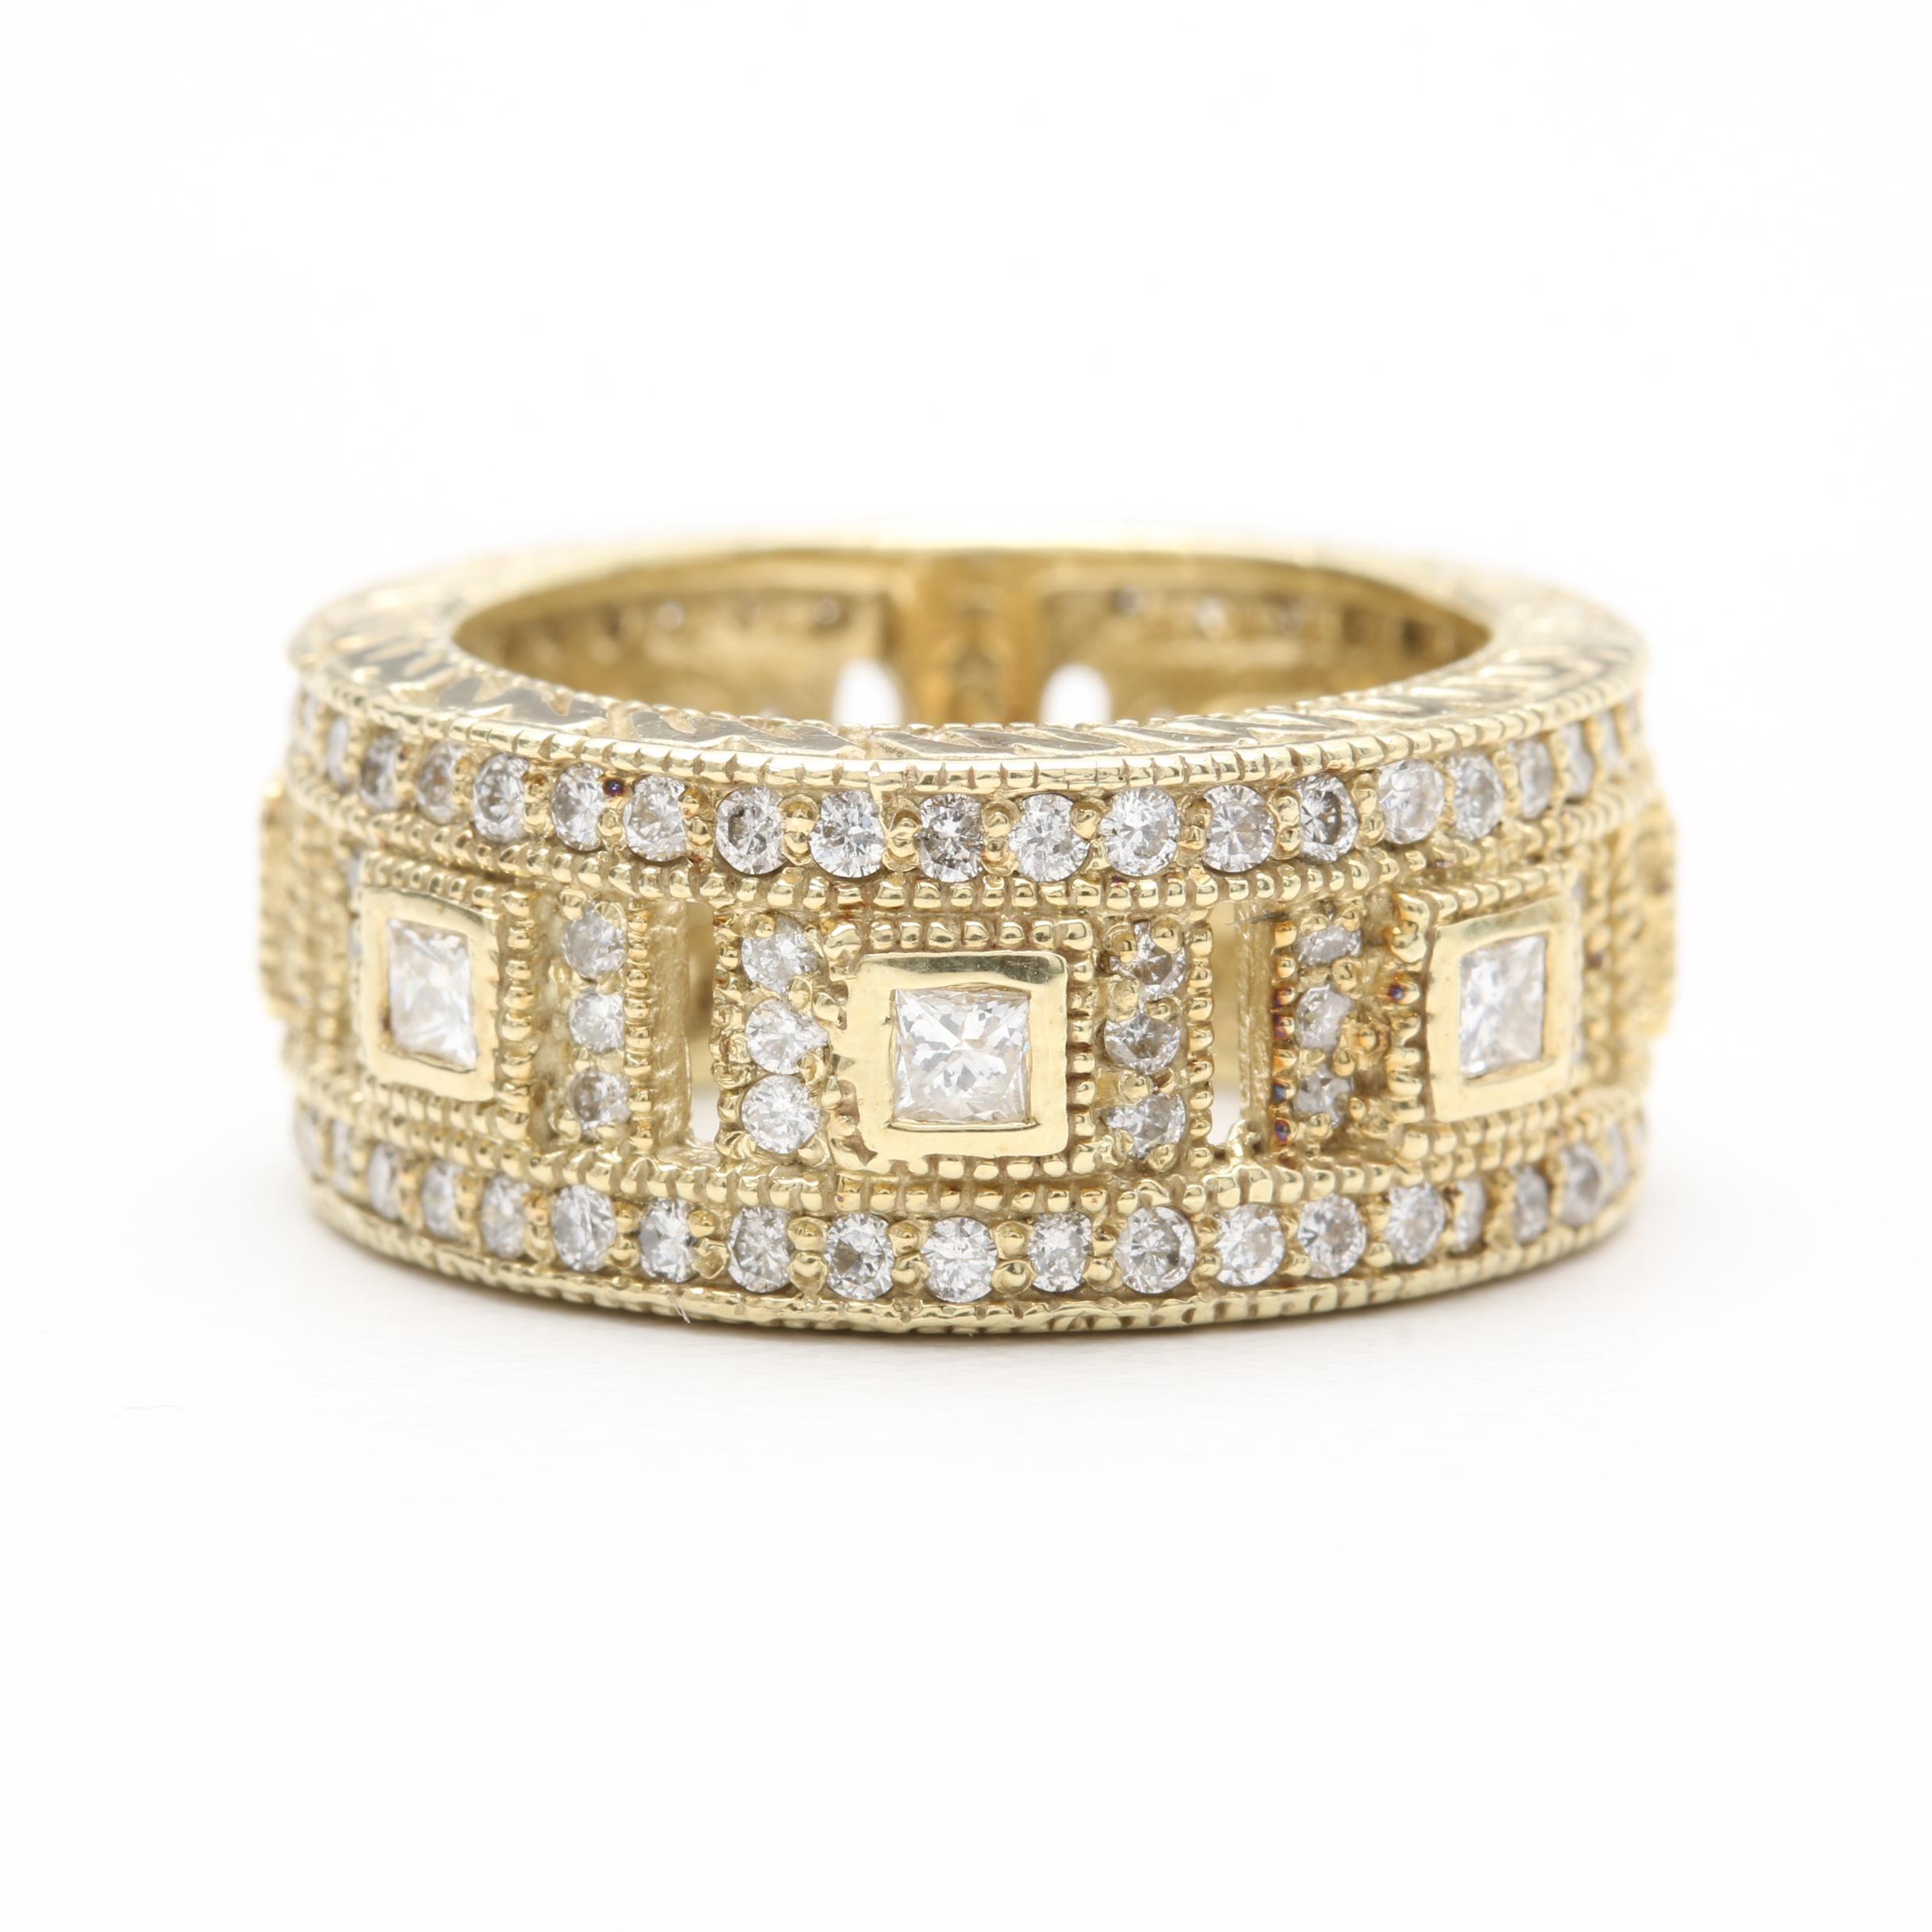 14K Yellow Gold 1.73 CTW Diamond Ring